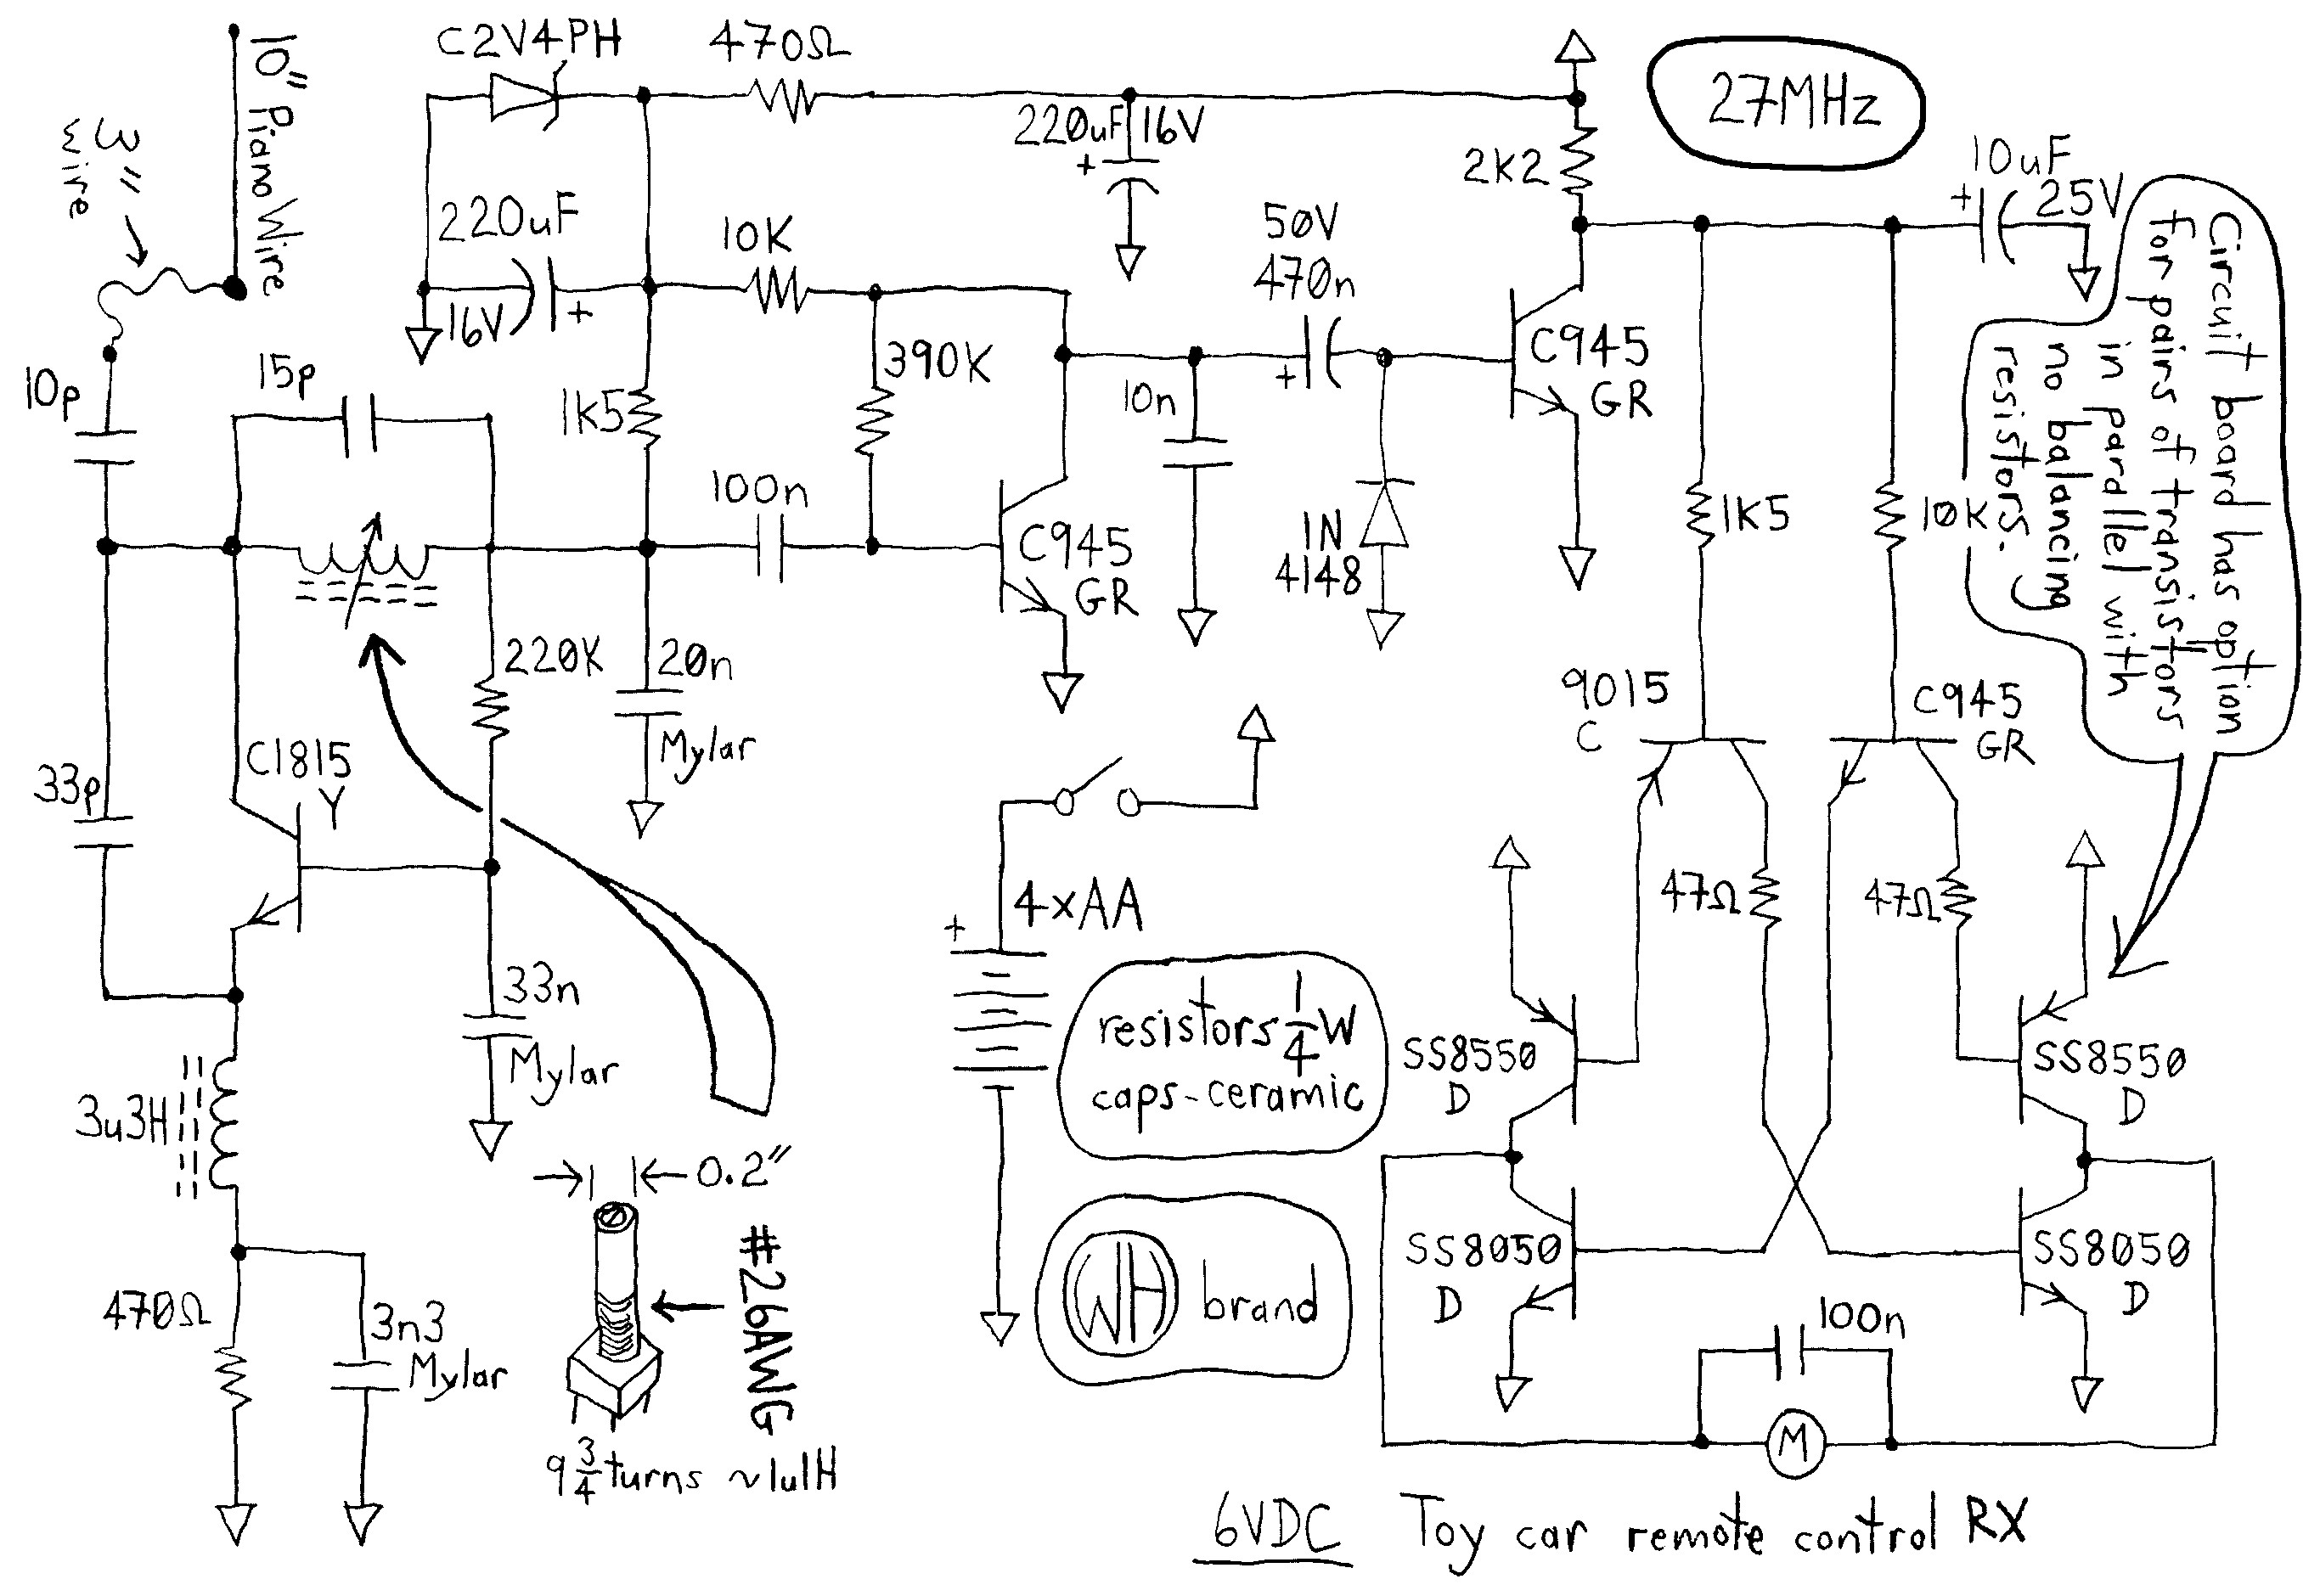 Rc Car Circuit Diagram Remote Control Car Drawing at Getdrawings Of Rc Car Circuit Diagram